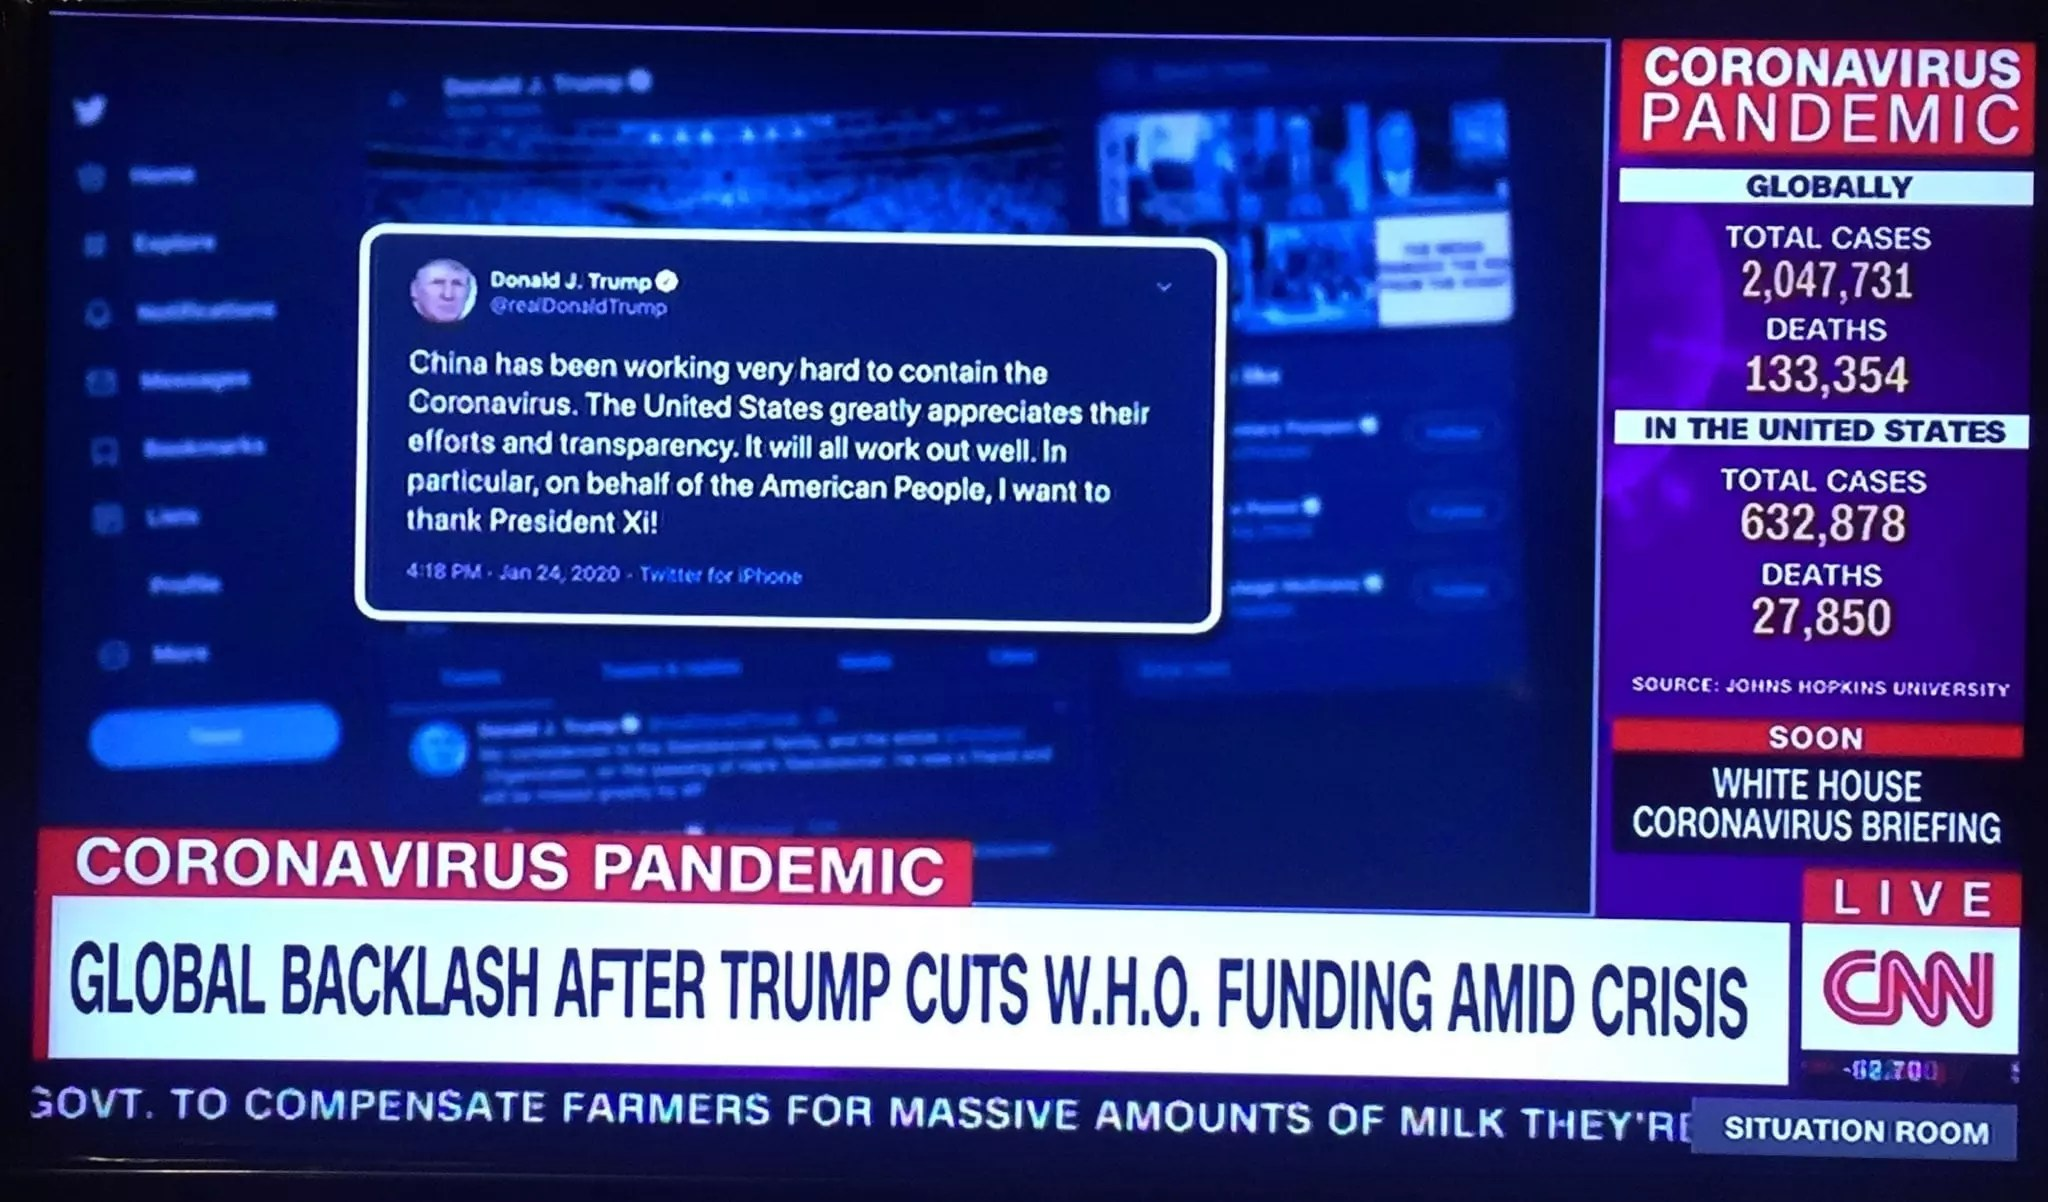 eNitiate | CNN | Coronavirus Pandemic | Social Media Metrics | Trump Backlash | W.H.O. | 16 Apr 2020